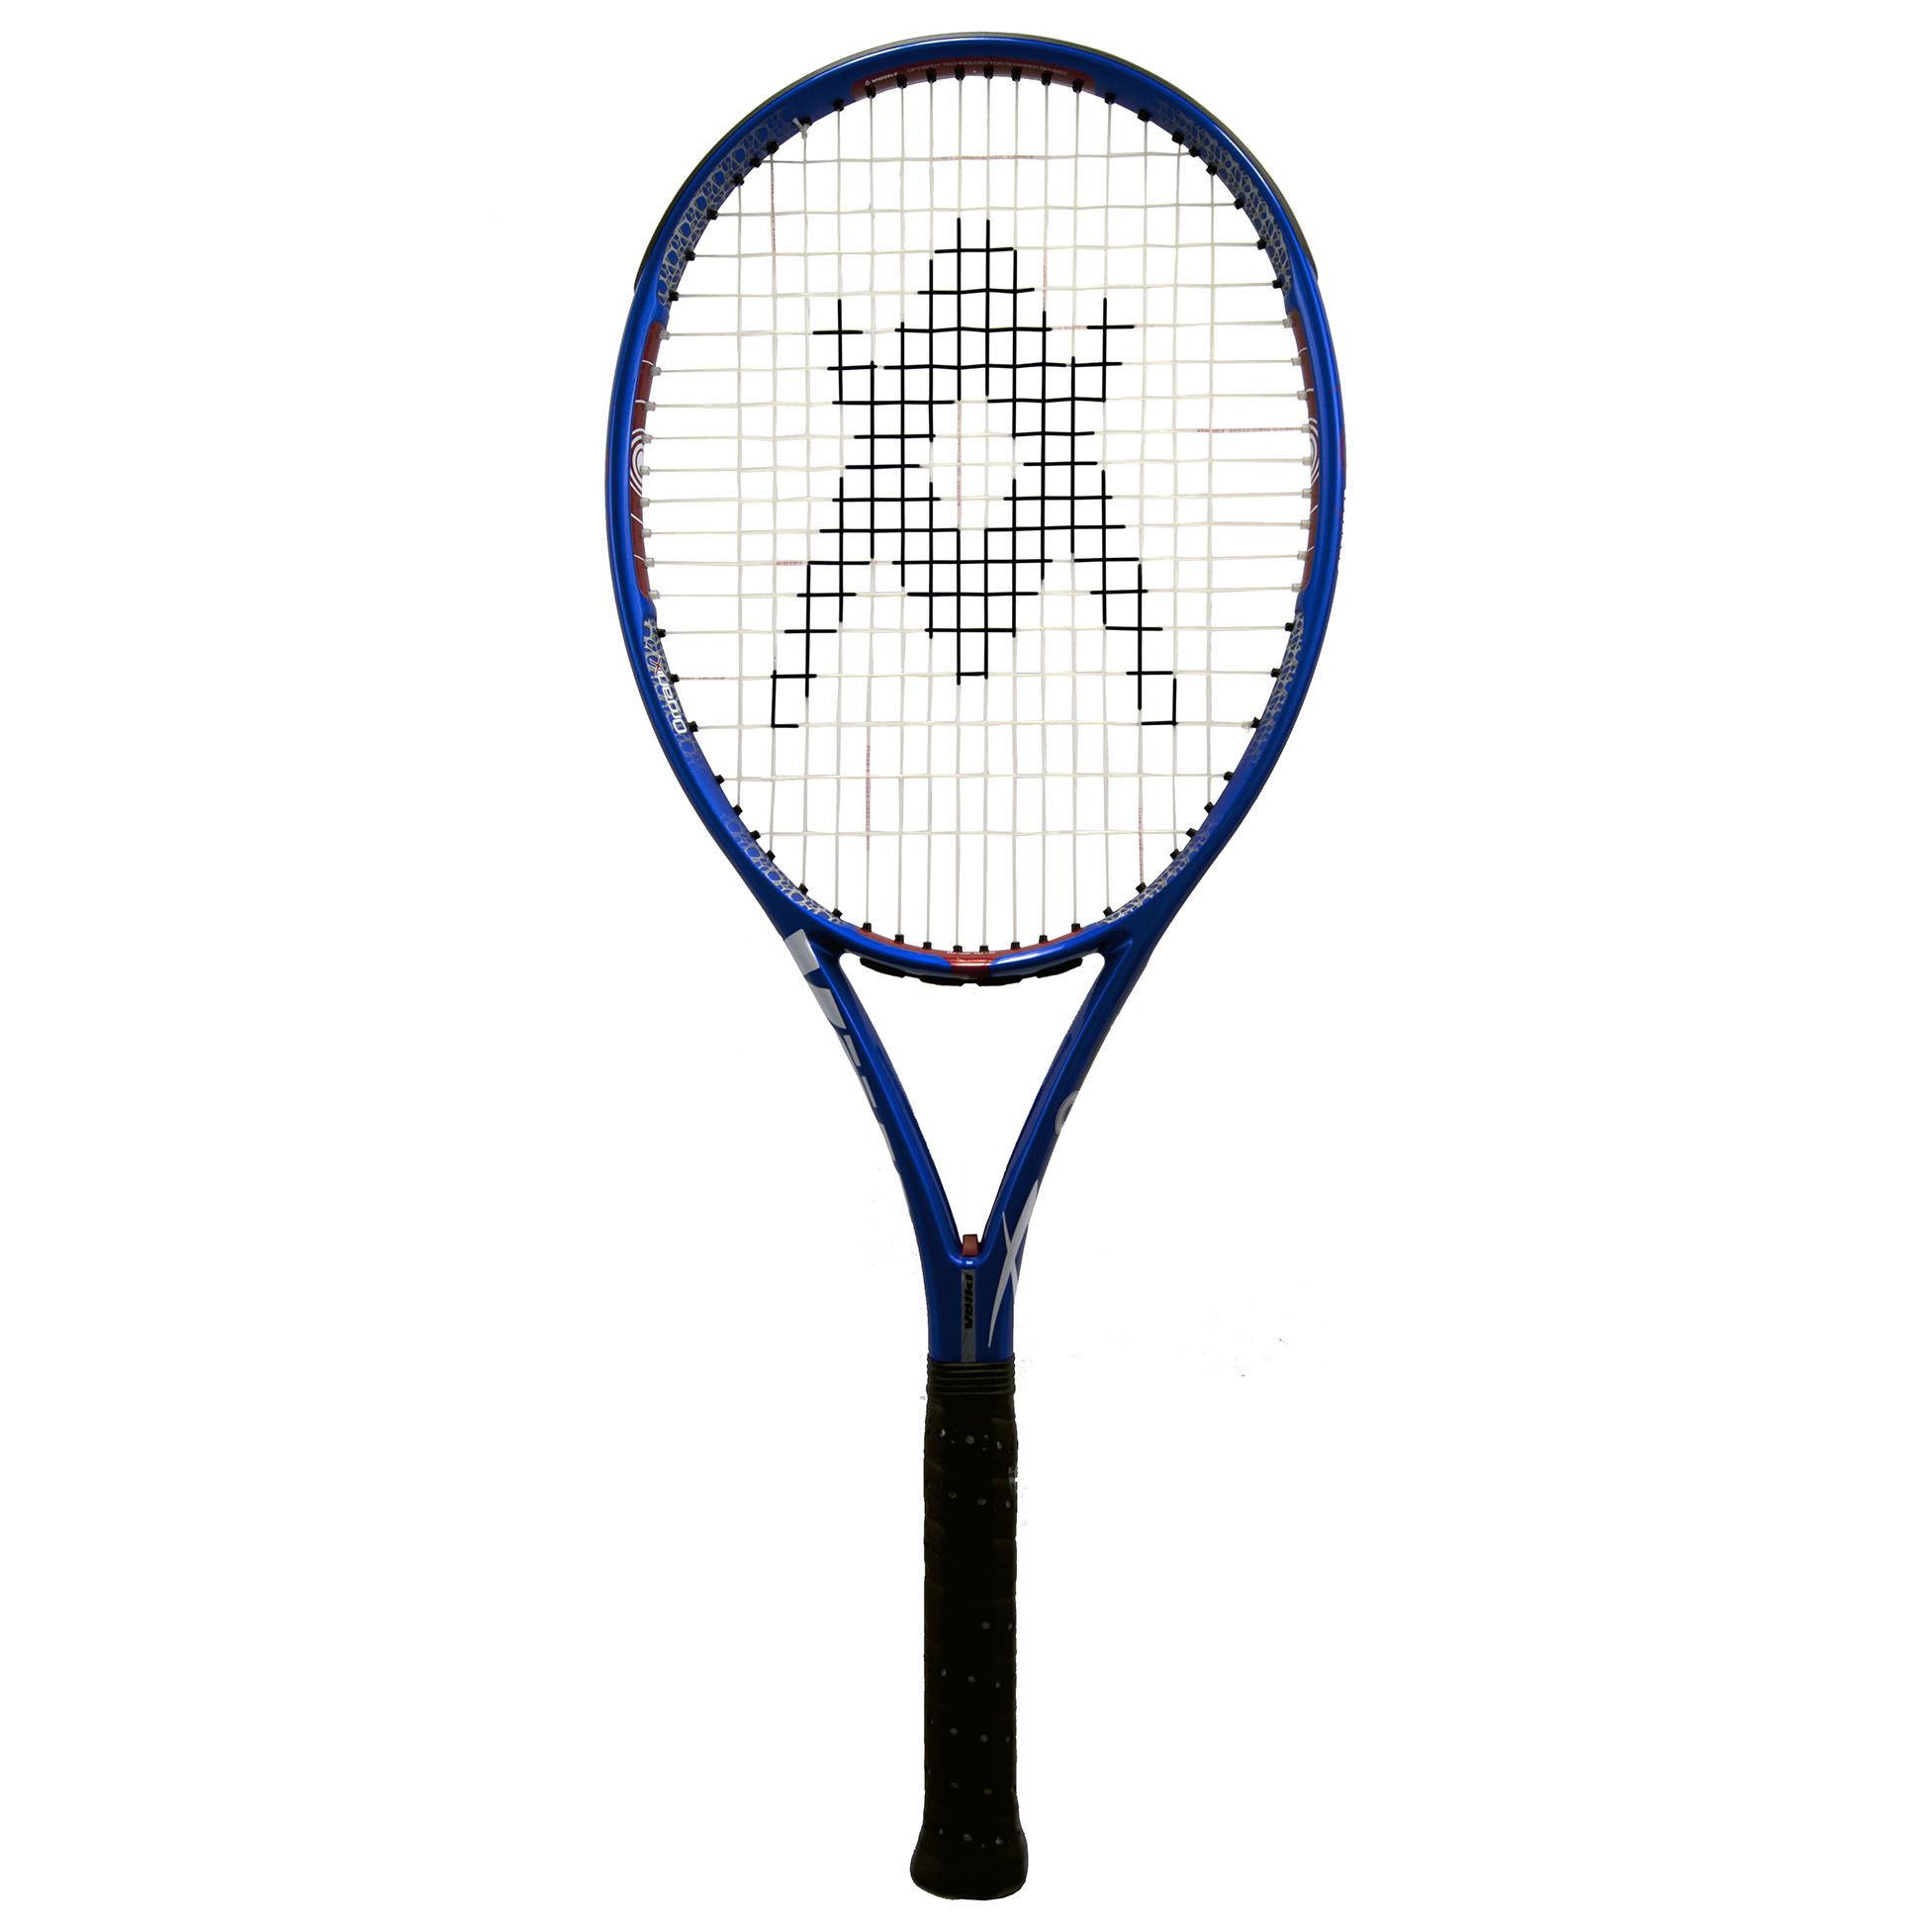 Volkl Organix 5 Tennis Racket - Sweatband.com